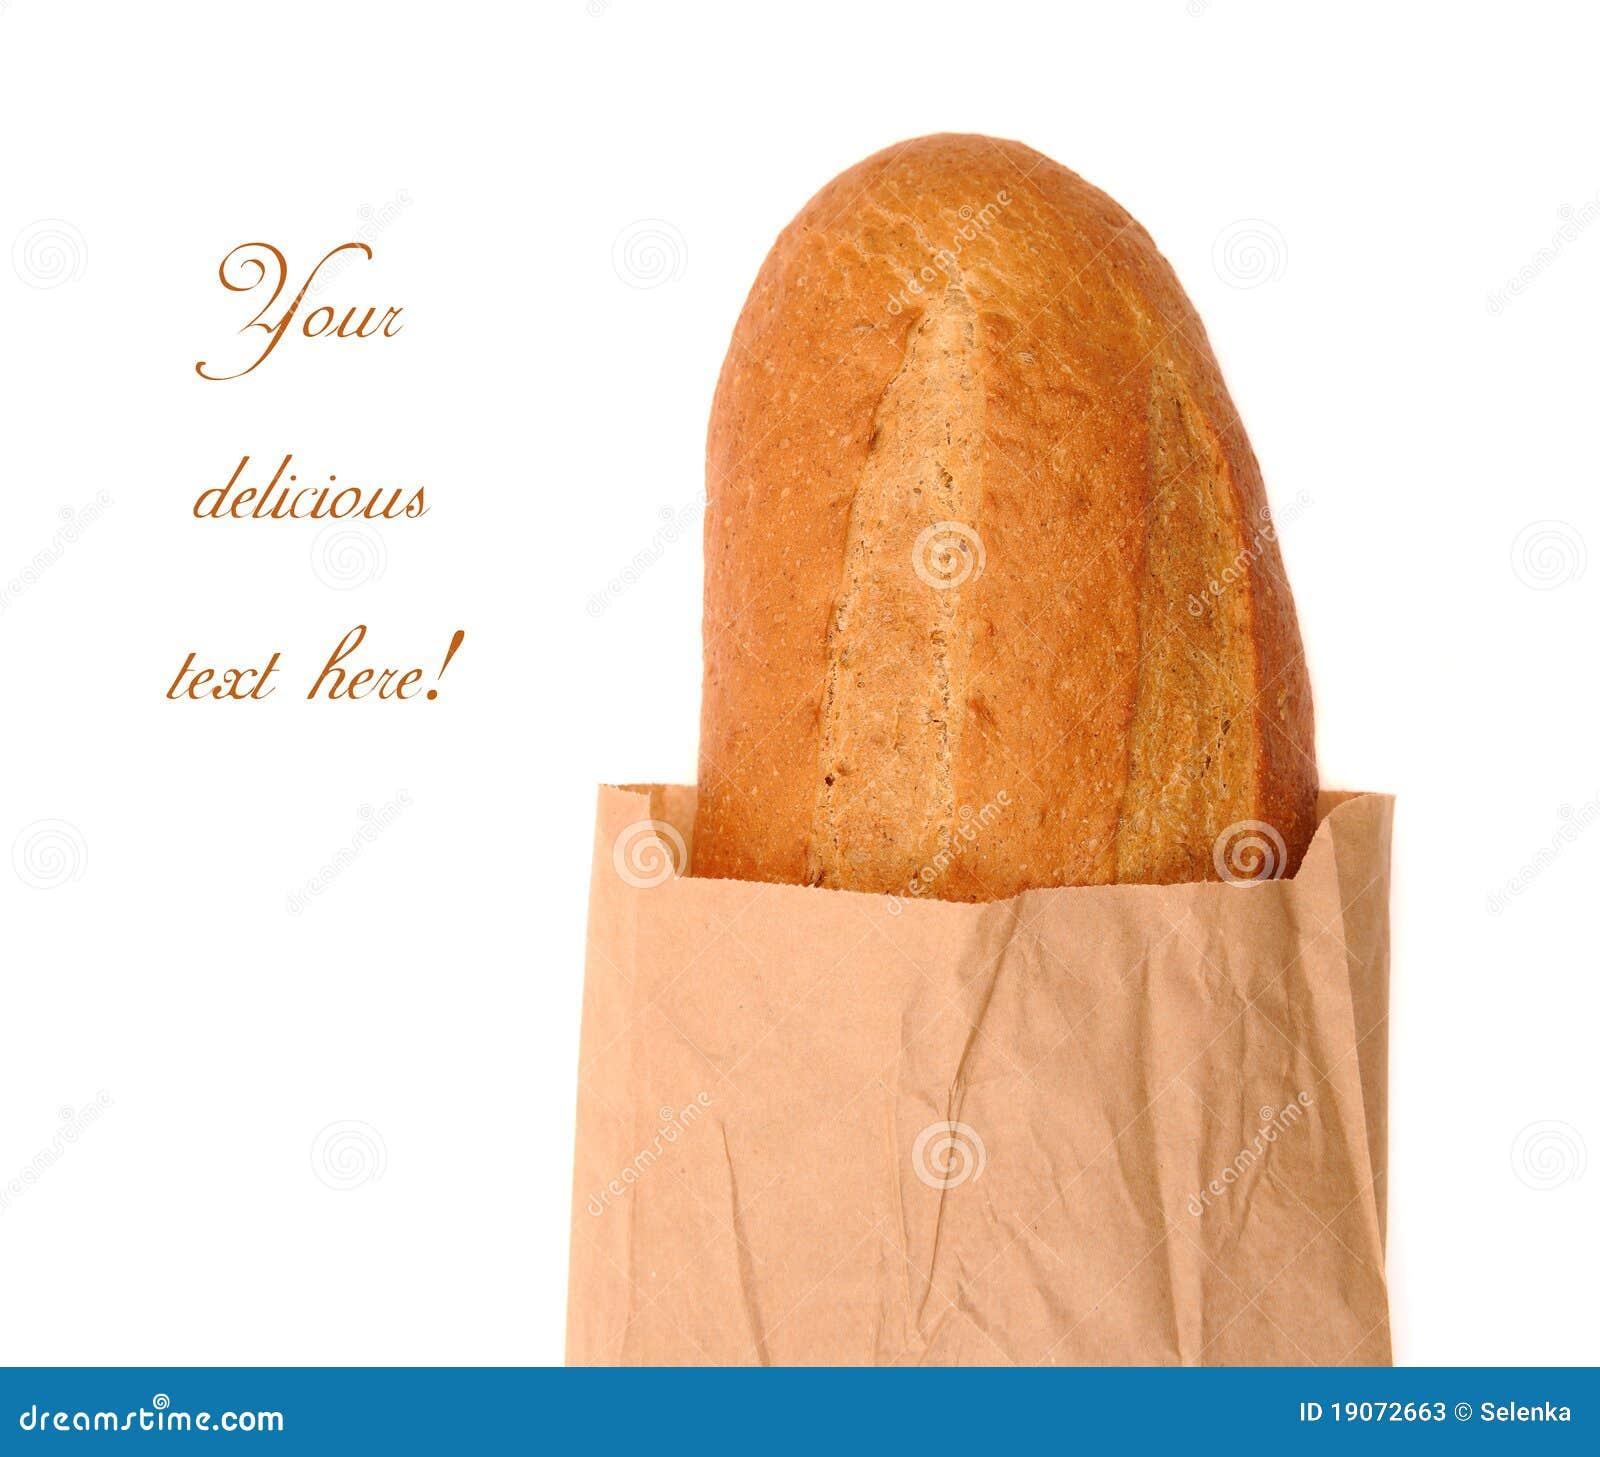 bread essay